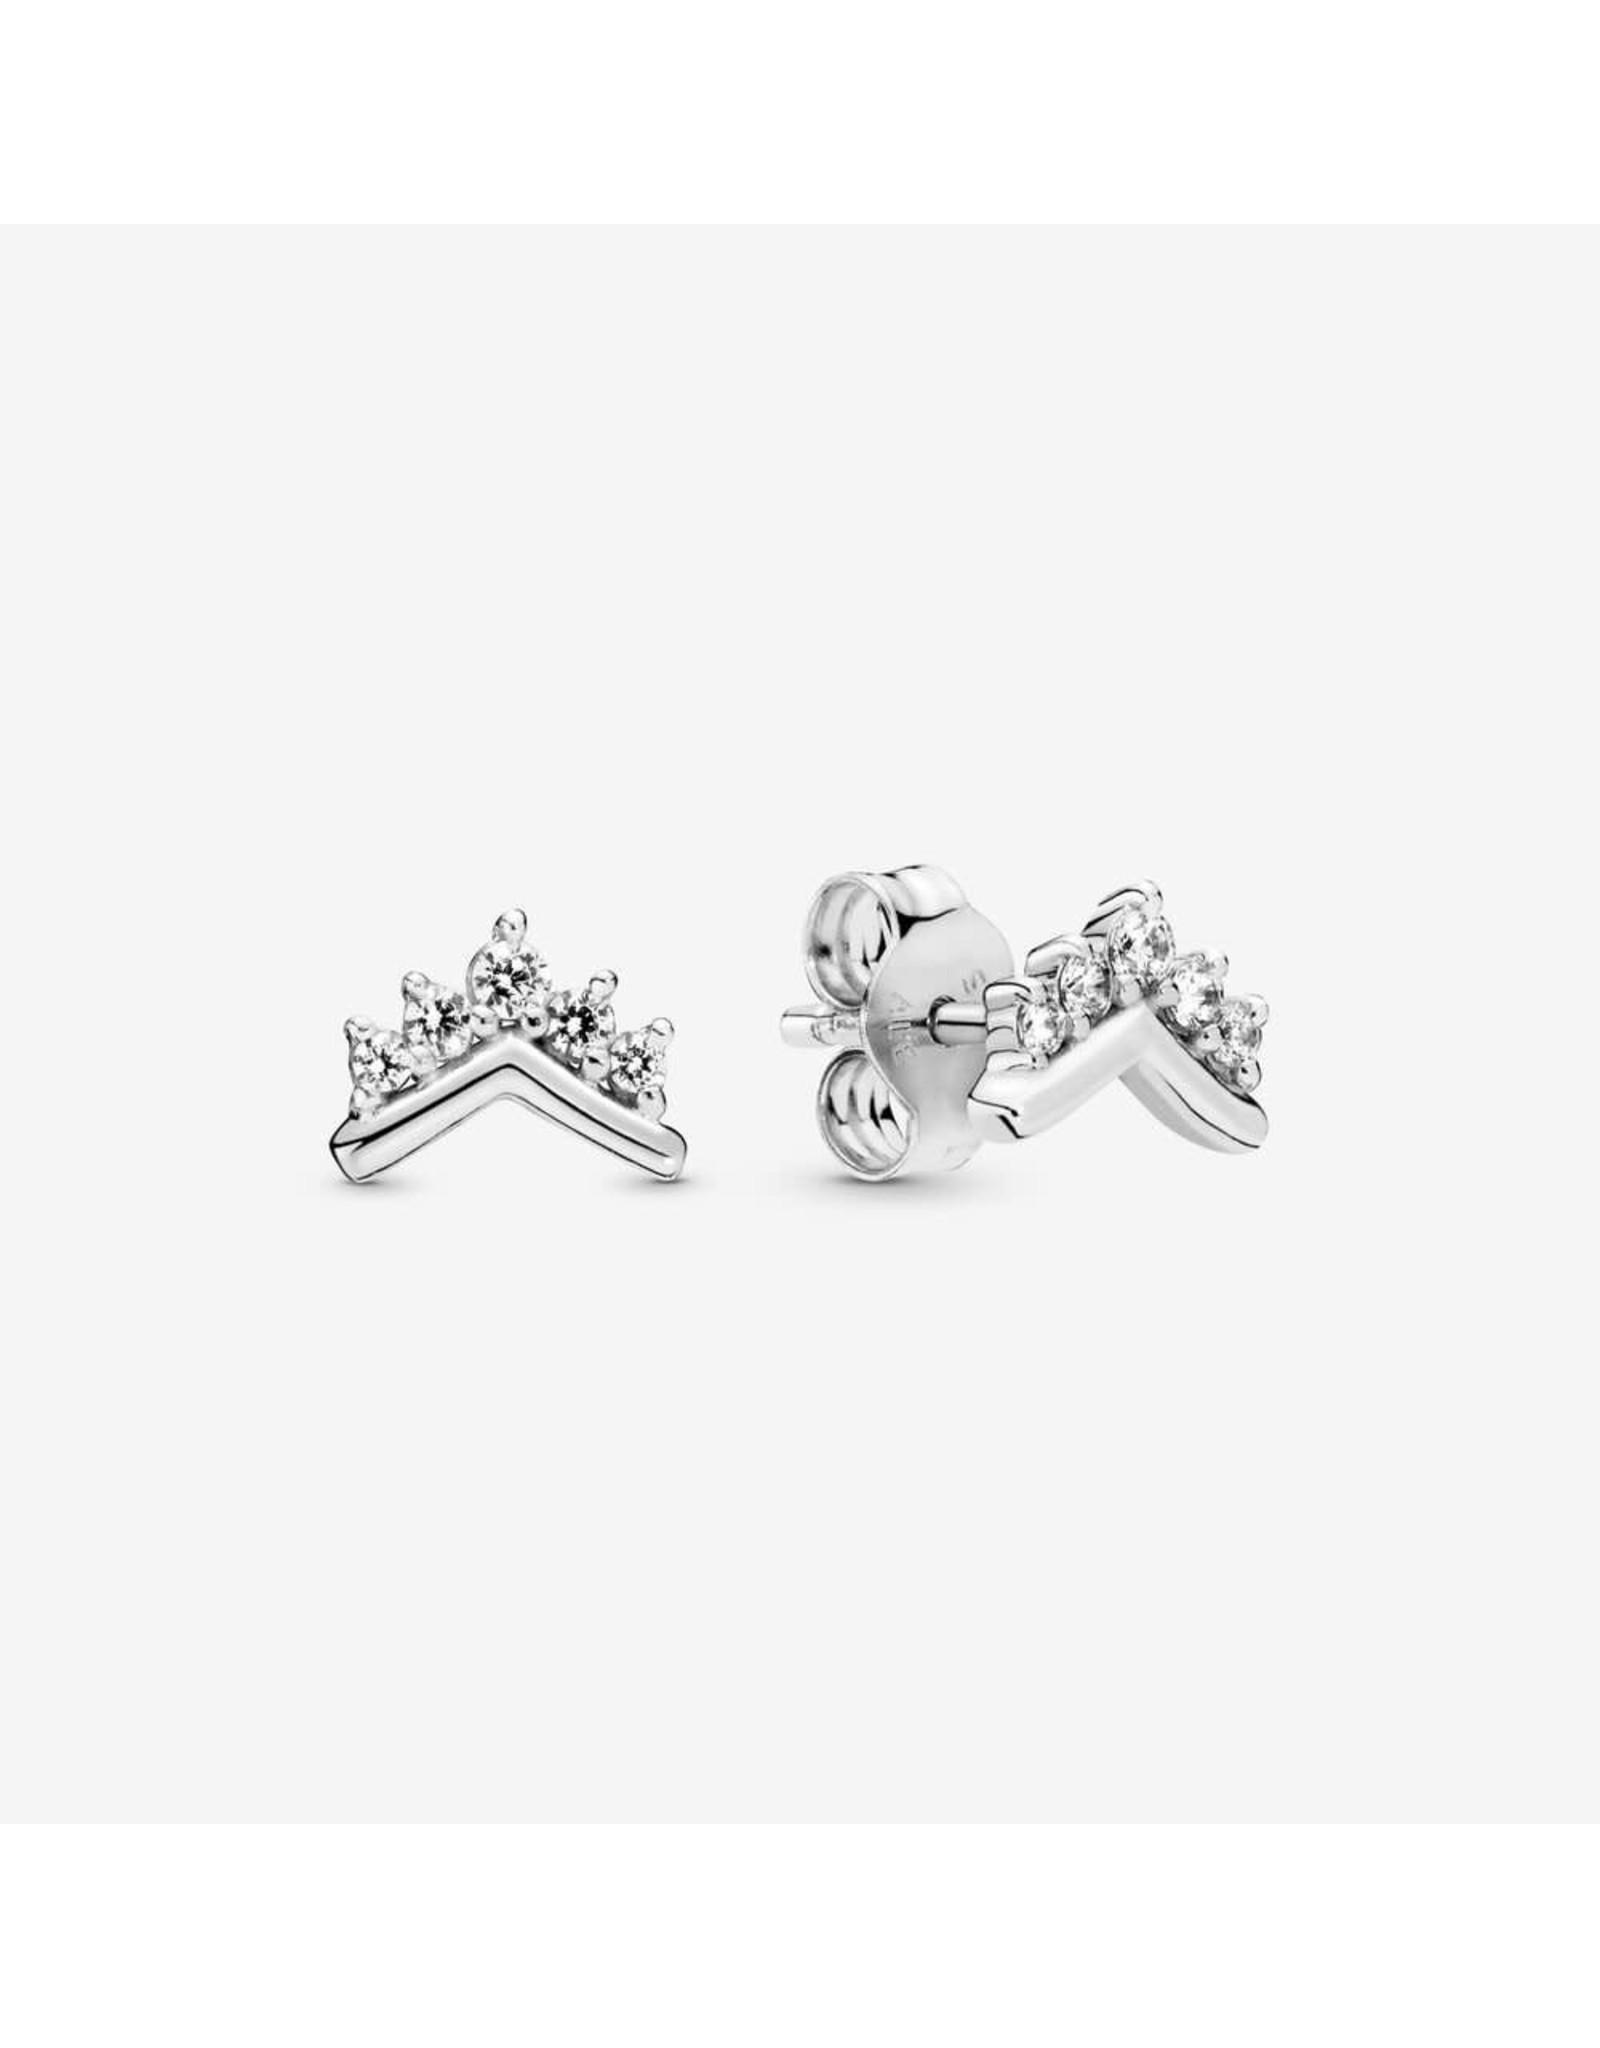 Pandora Pandora Earrings, 298274CZ,Tiara Wishbone